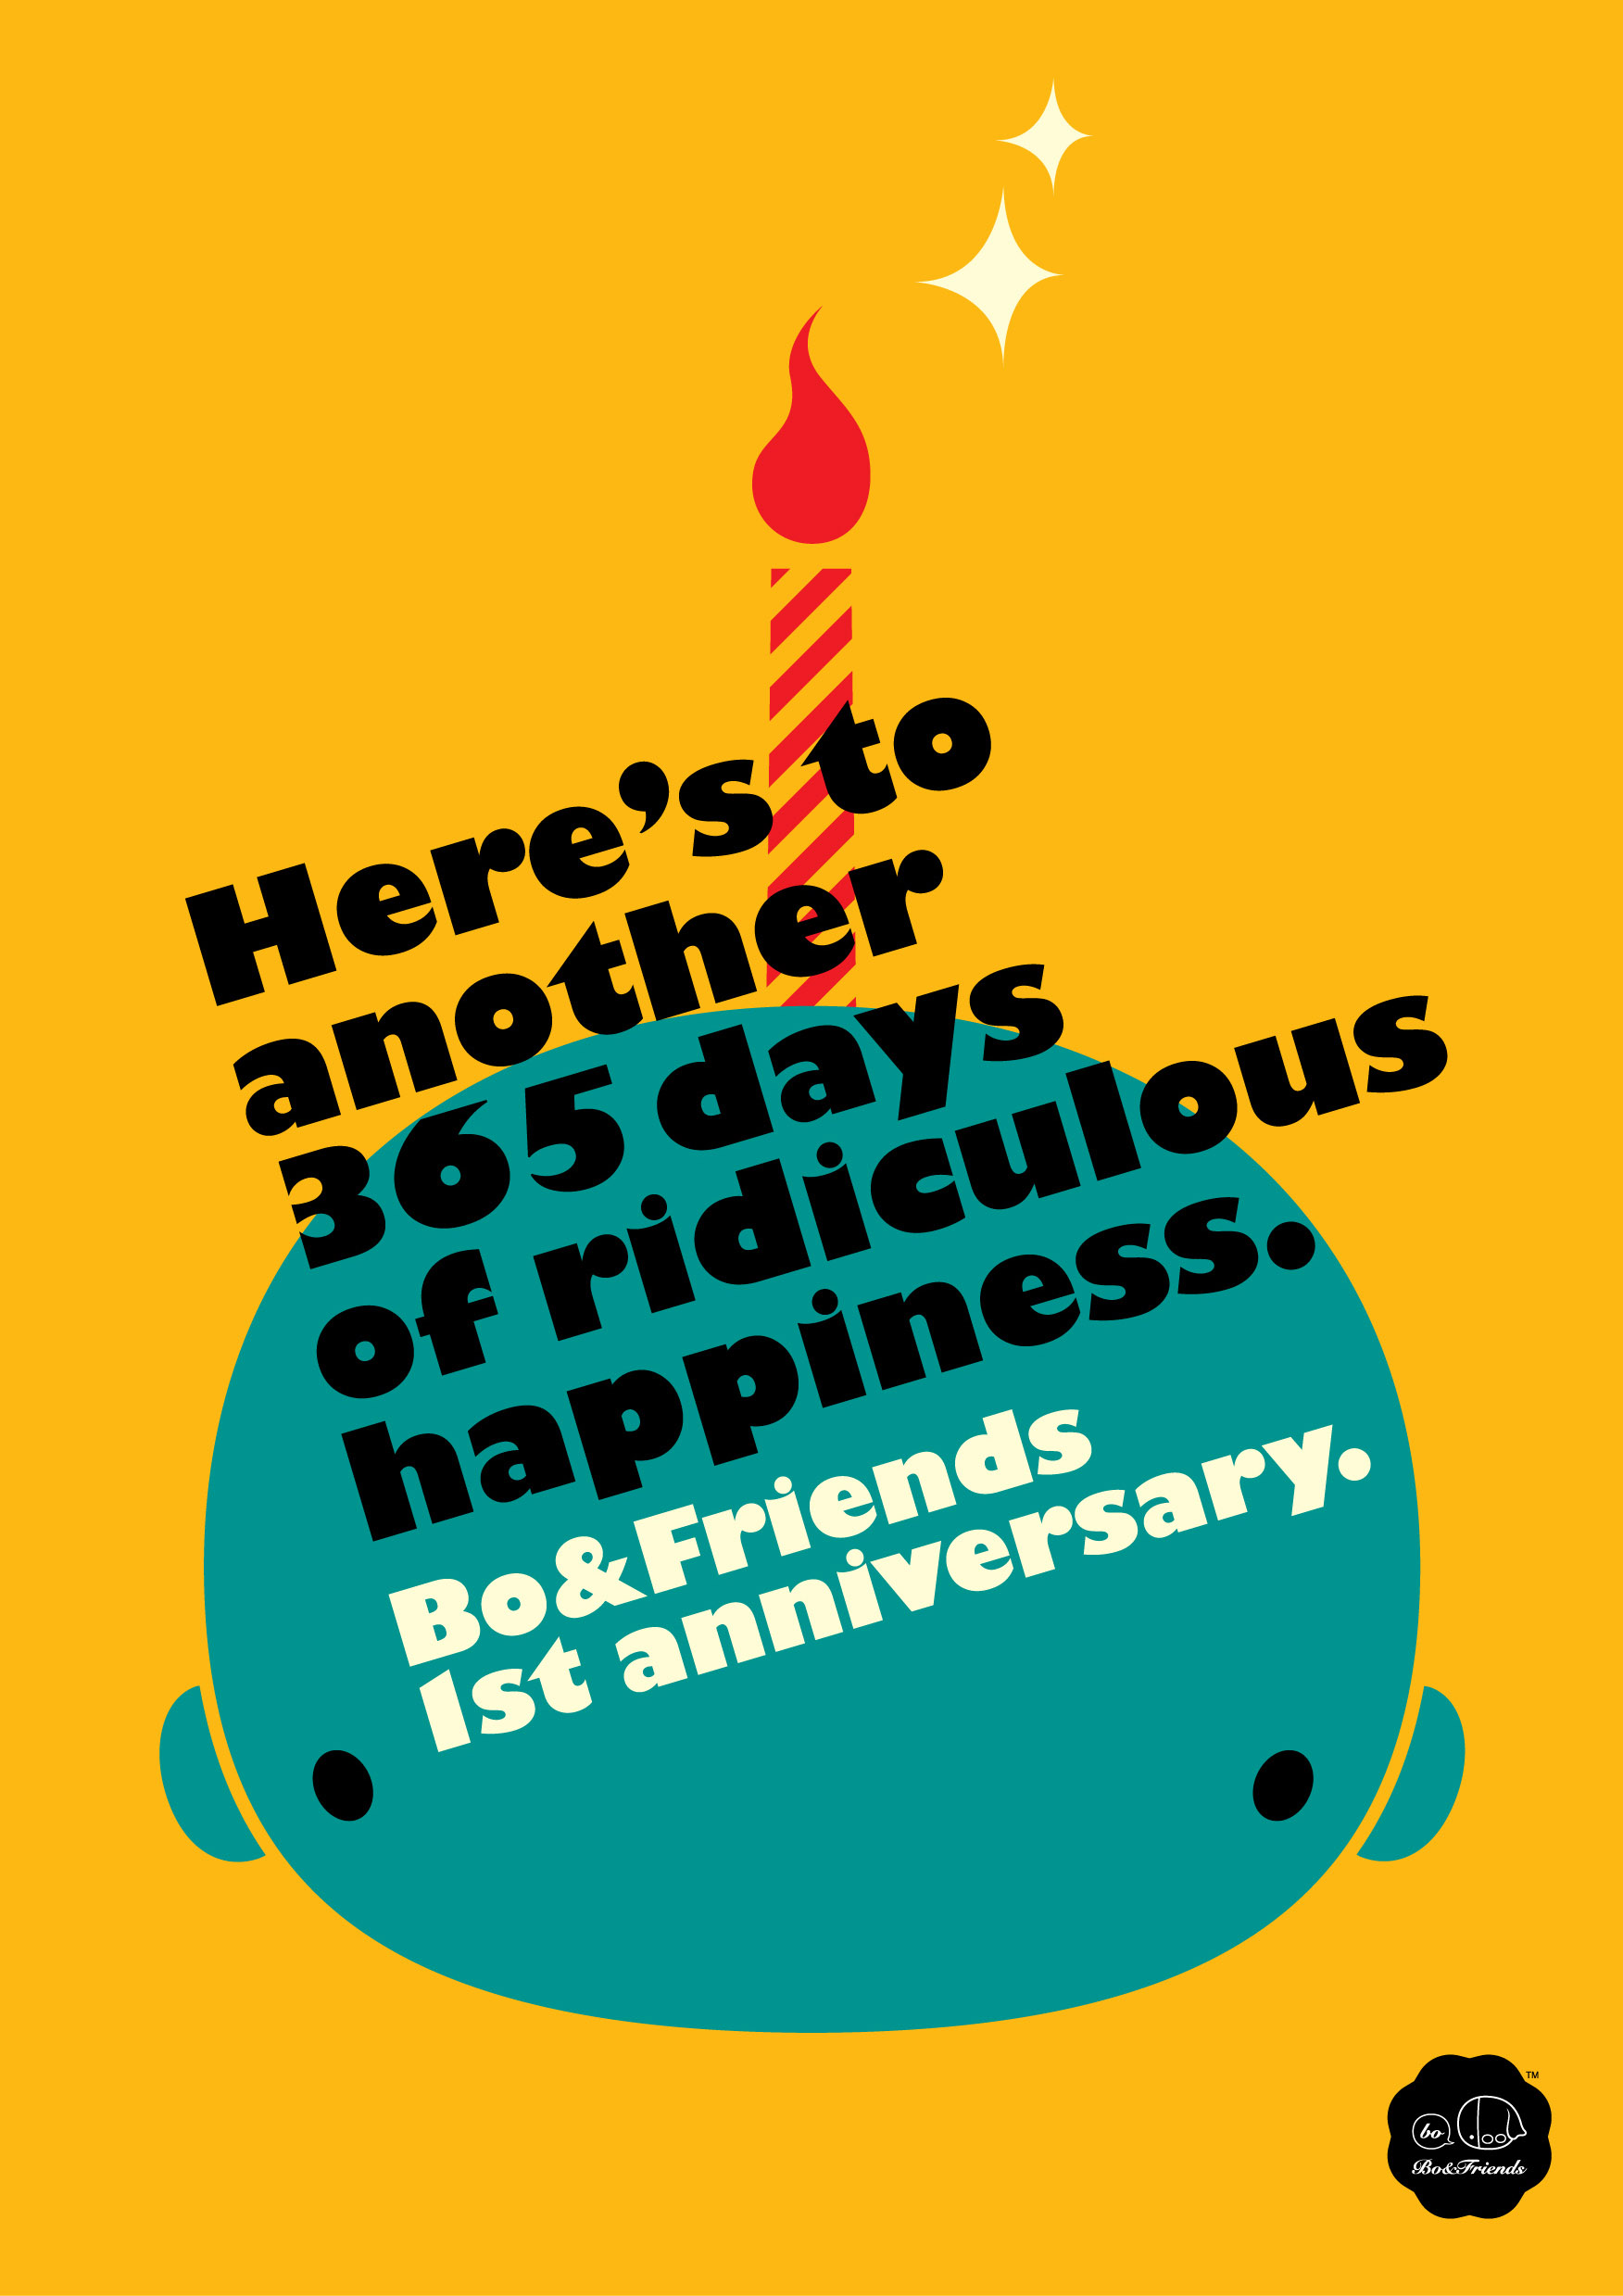 Happy work anniversary graphics clipart best